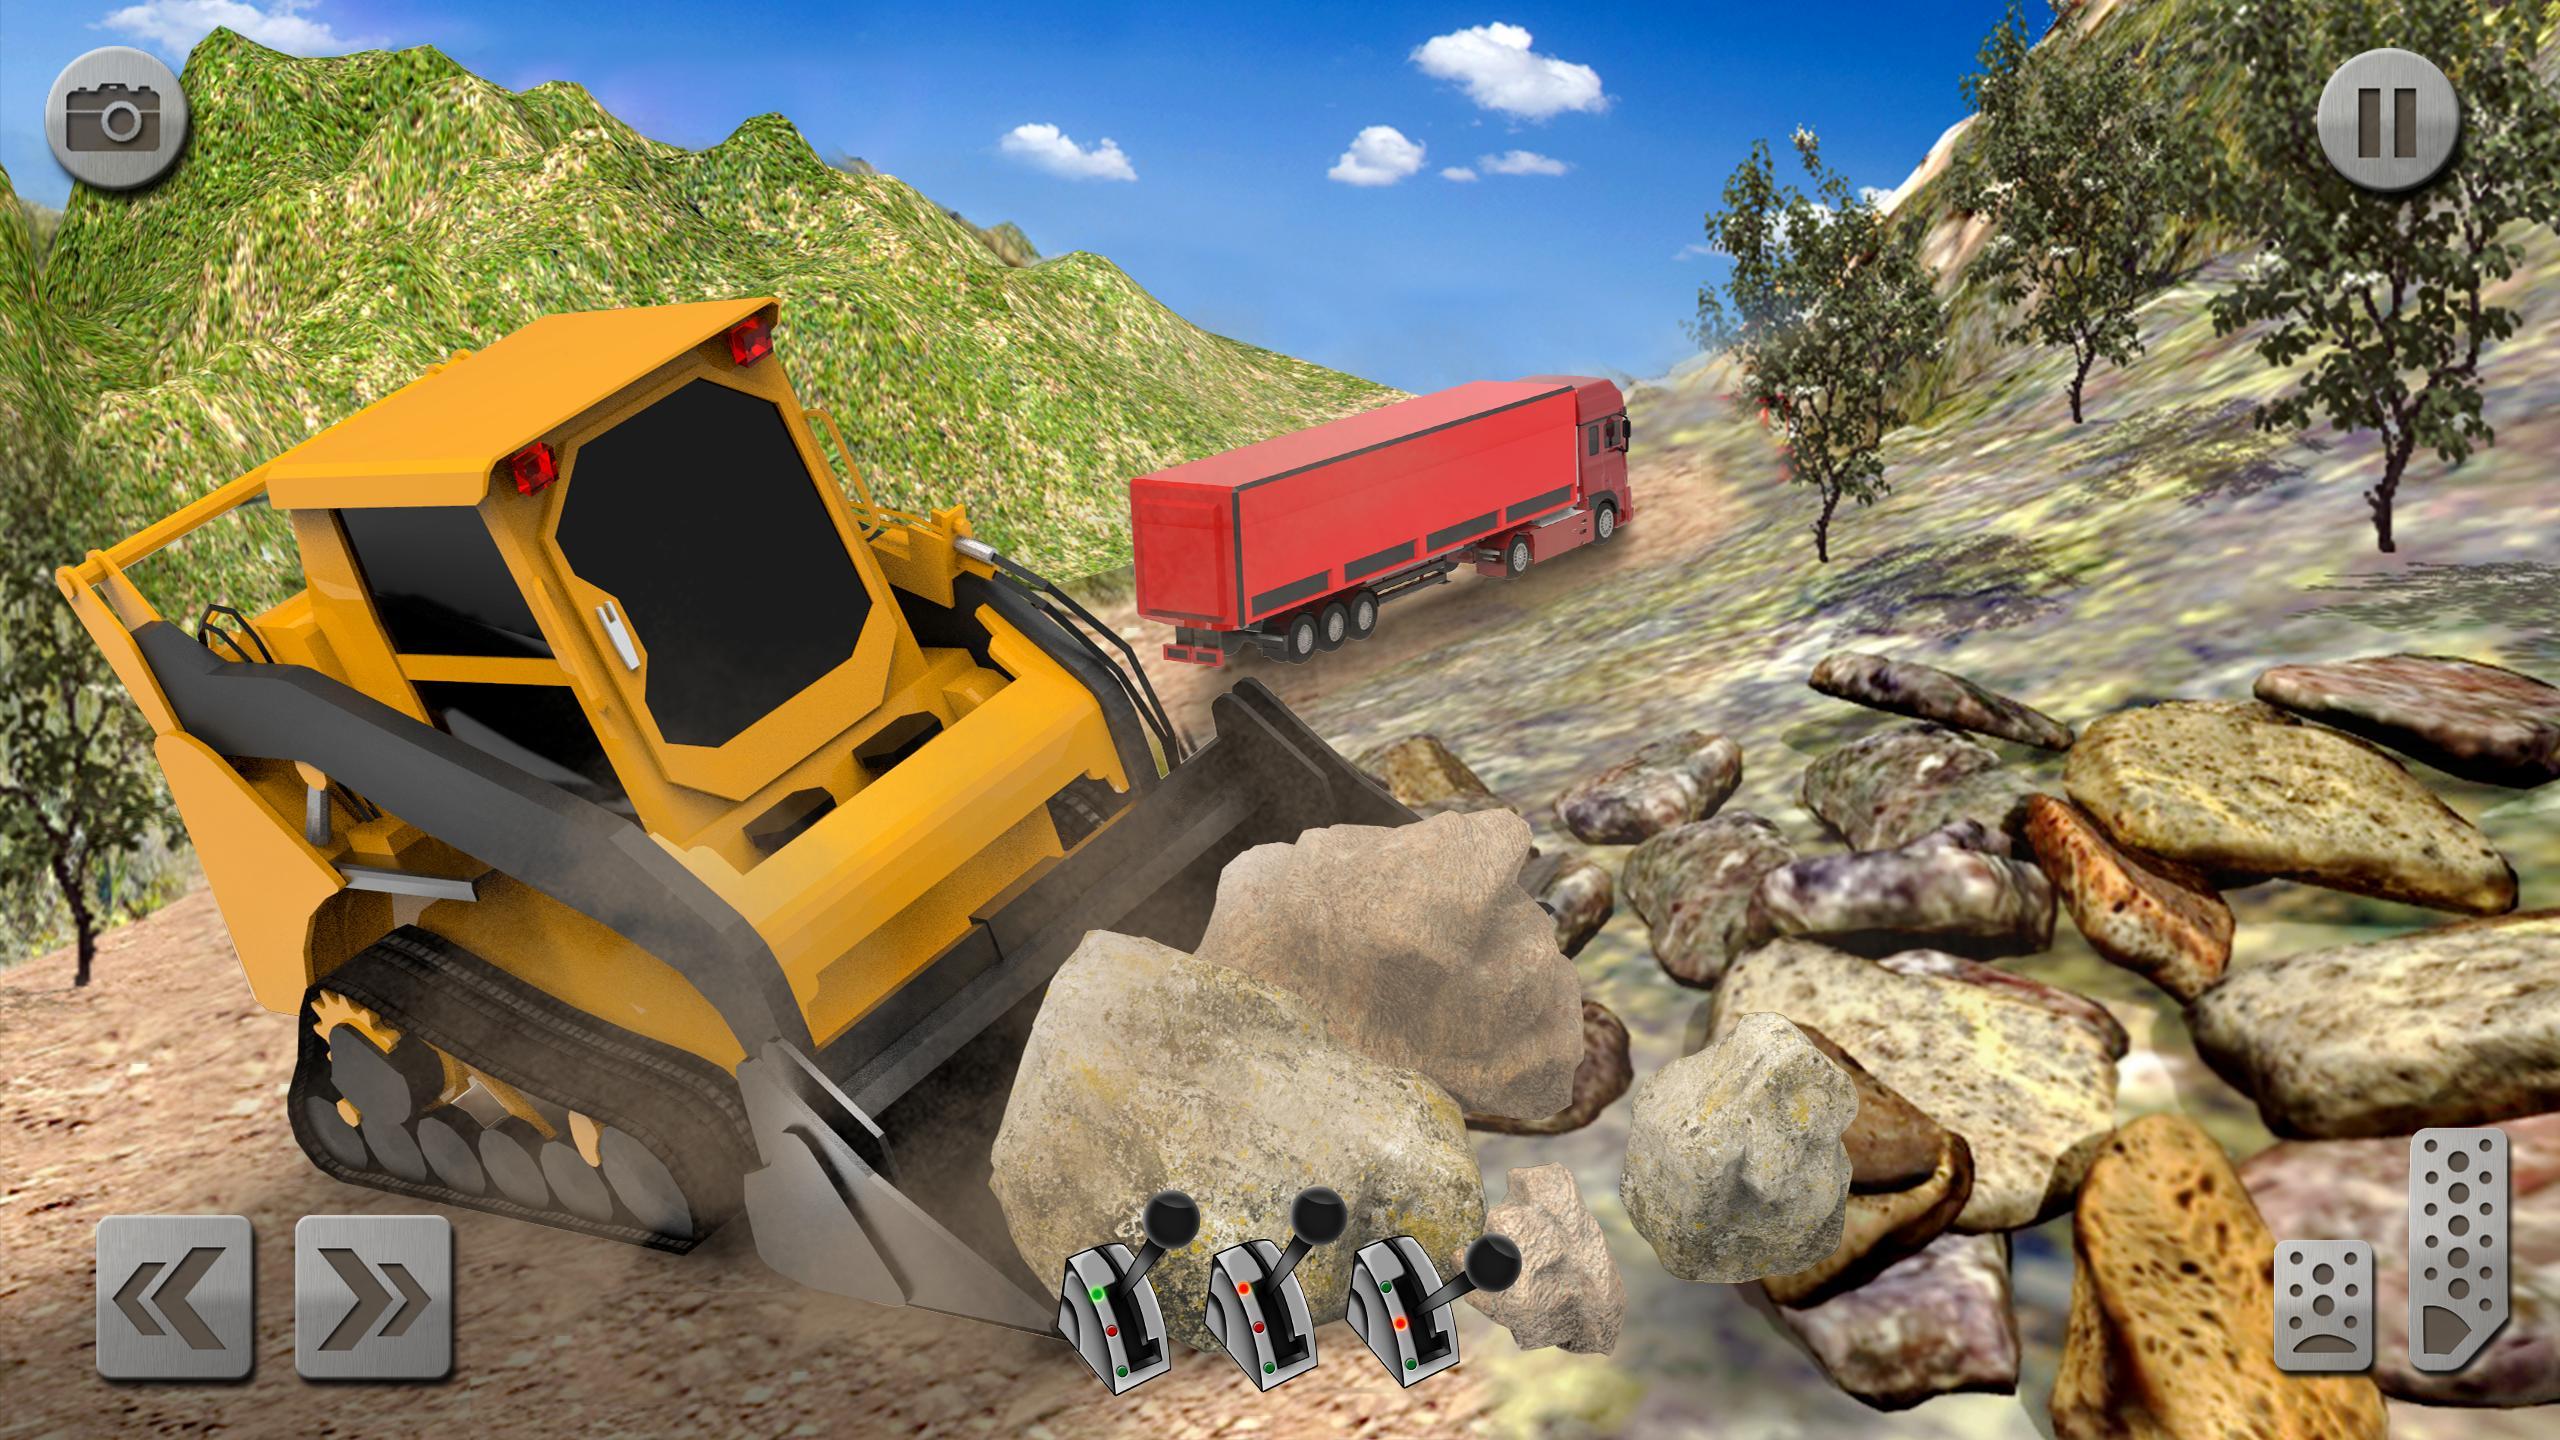 Sand Excavator Truck Driving Rescue Simulator game 5.2 Screenshot 20